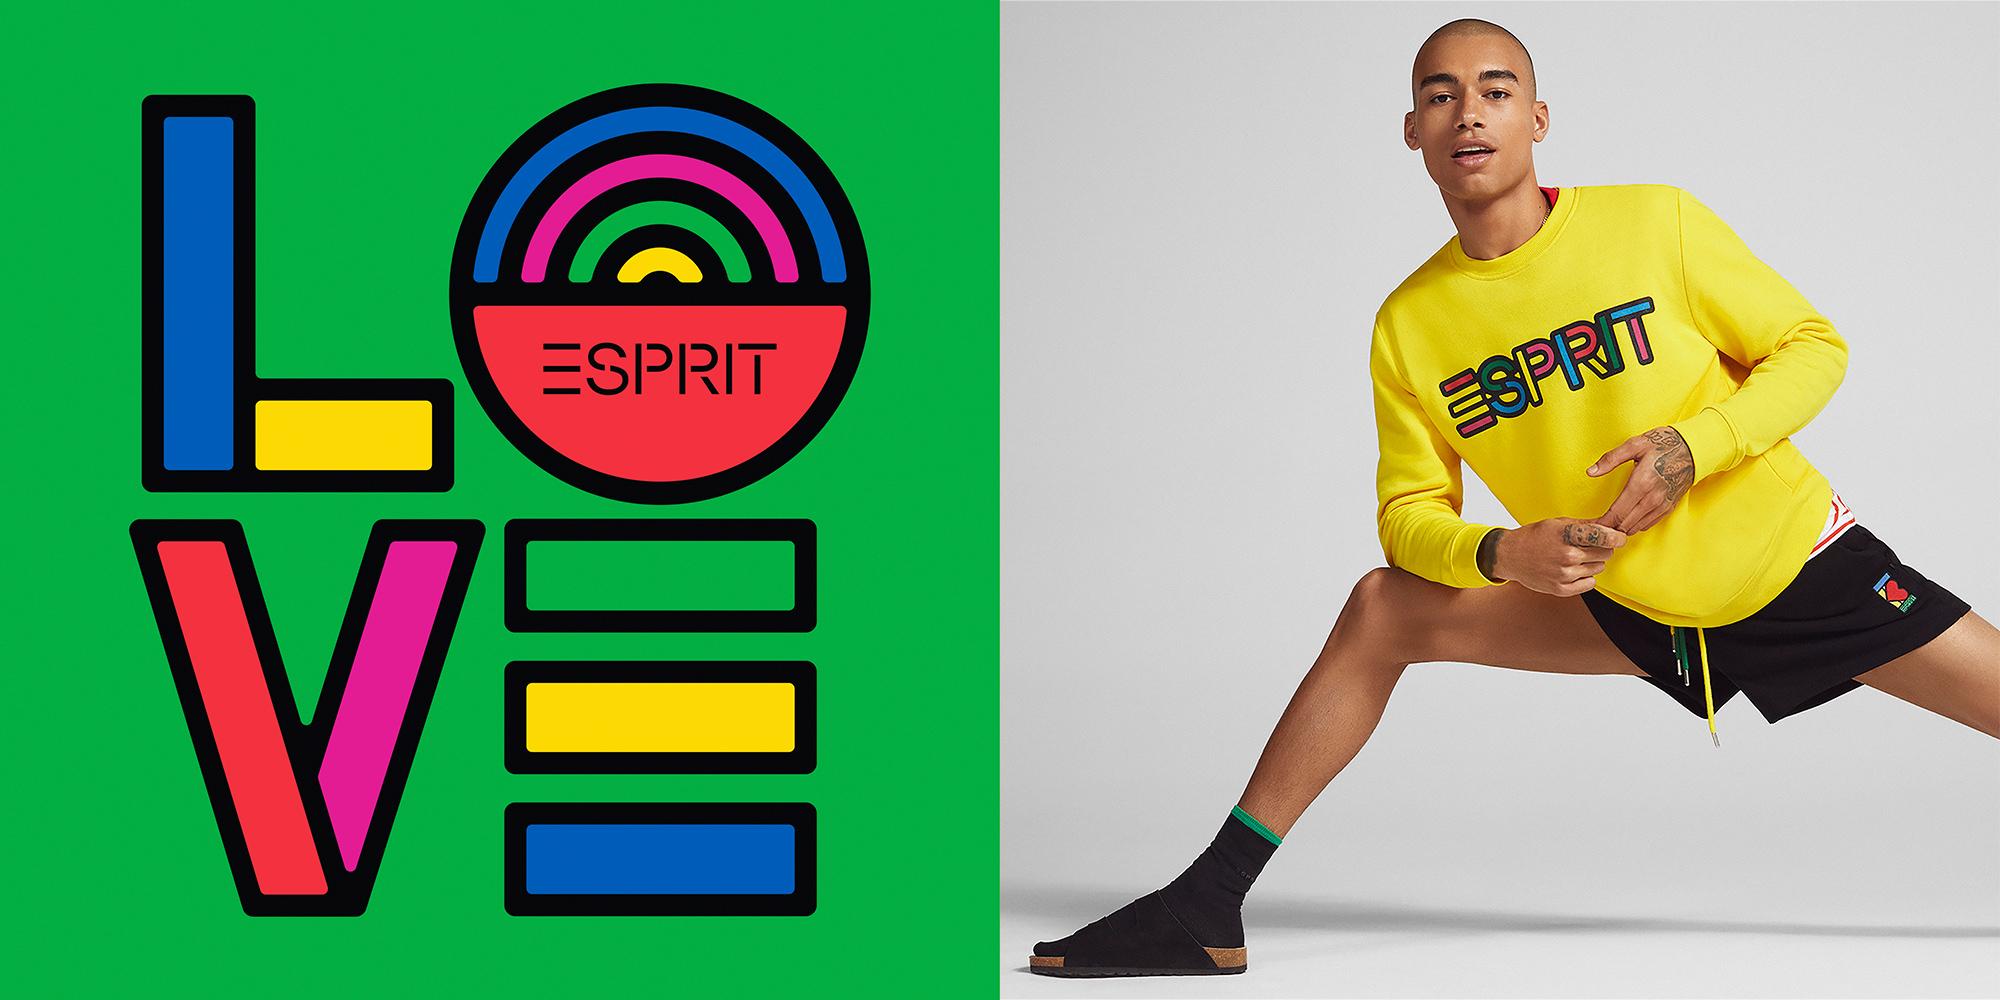 Esprit-CraigKarl-5